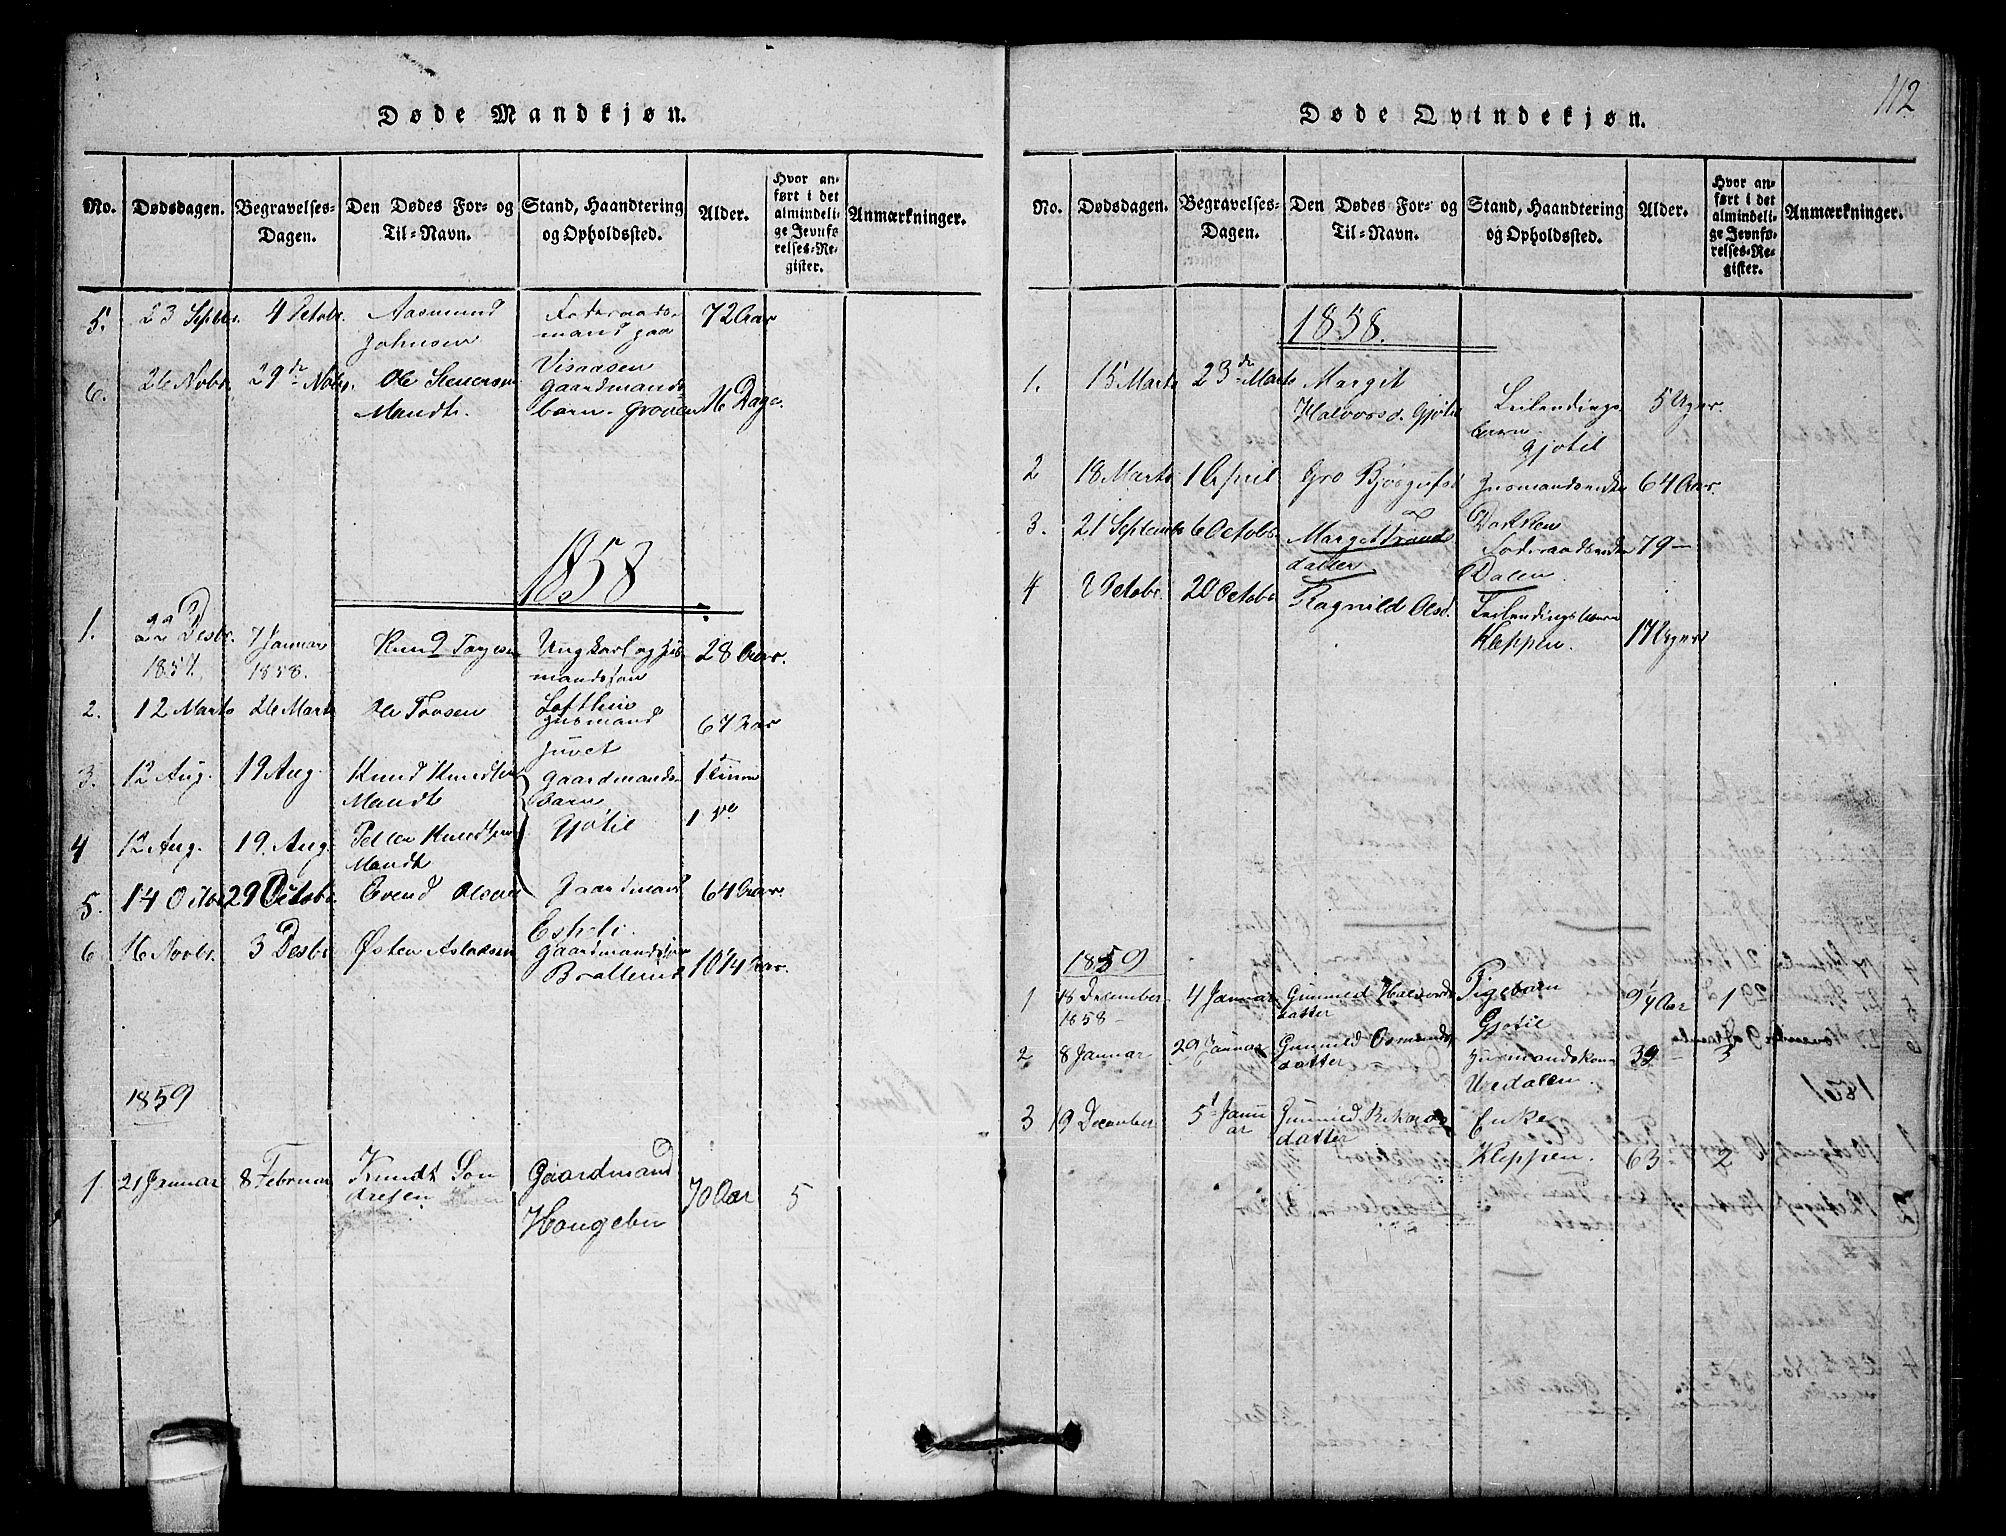 SAKO, Lårdal kirkebøker, G/Gb/L0001: Klokkerbok nr. II 1, 1815-1865, s. 112